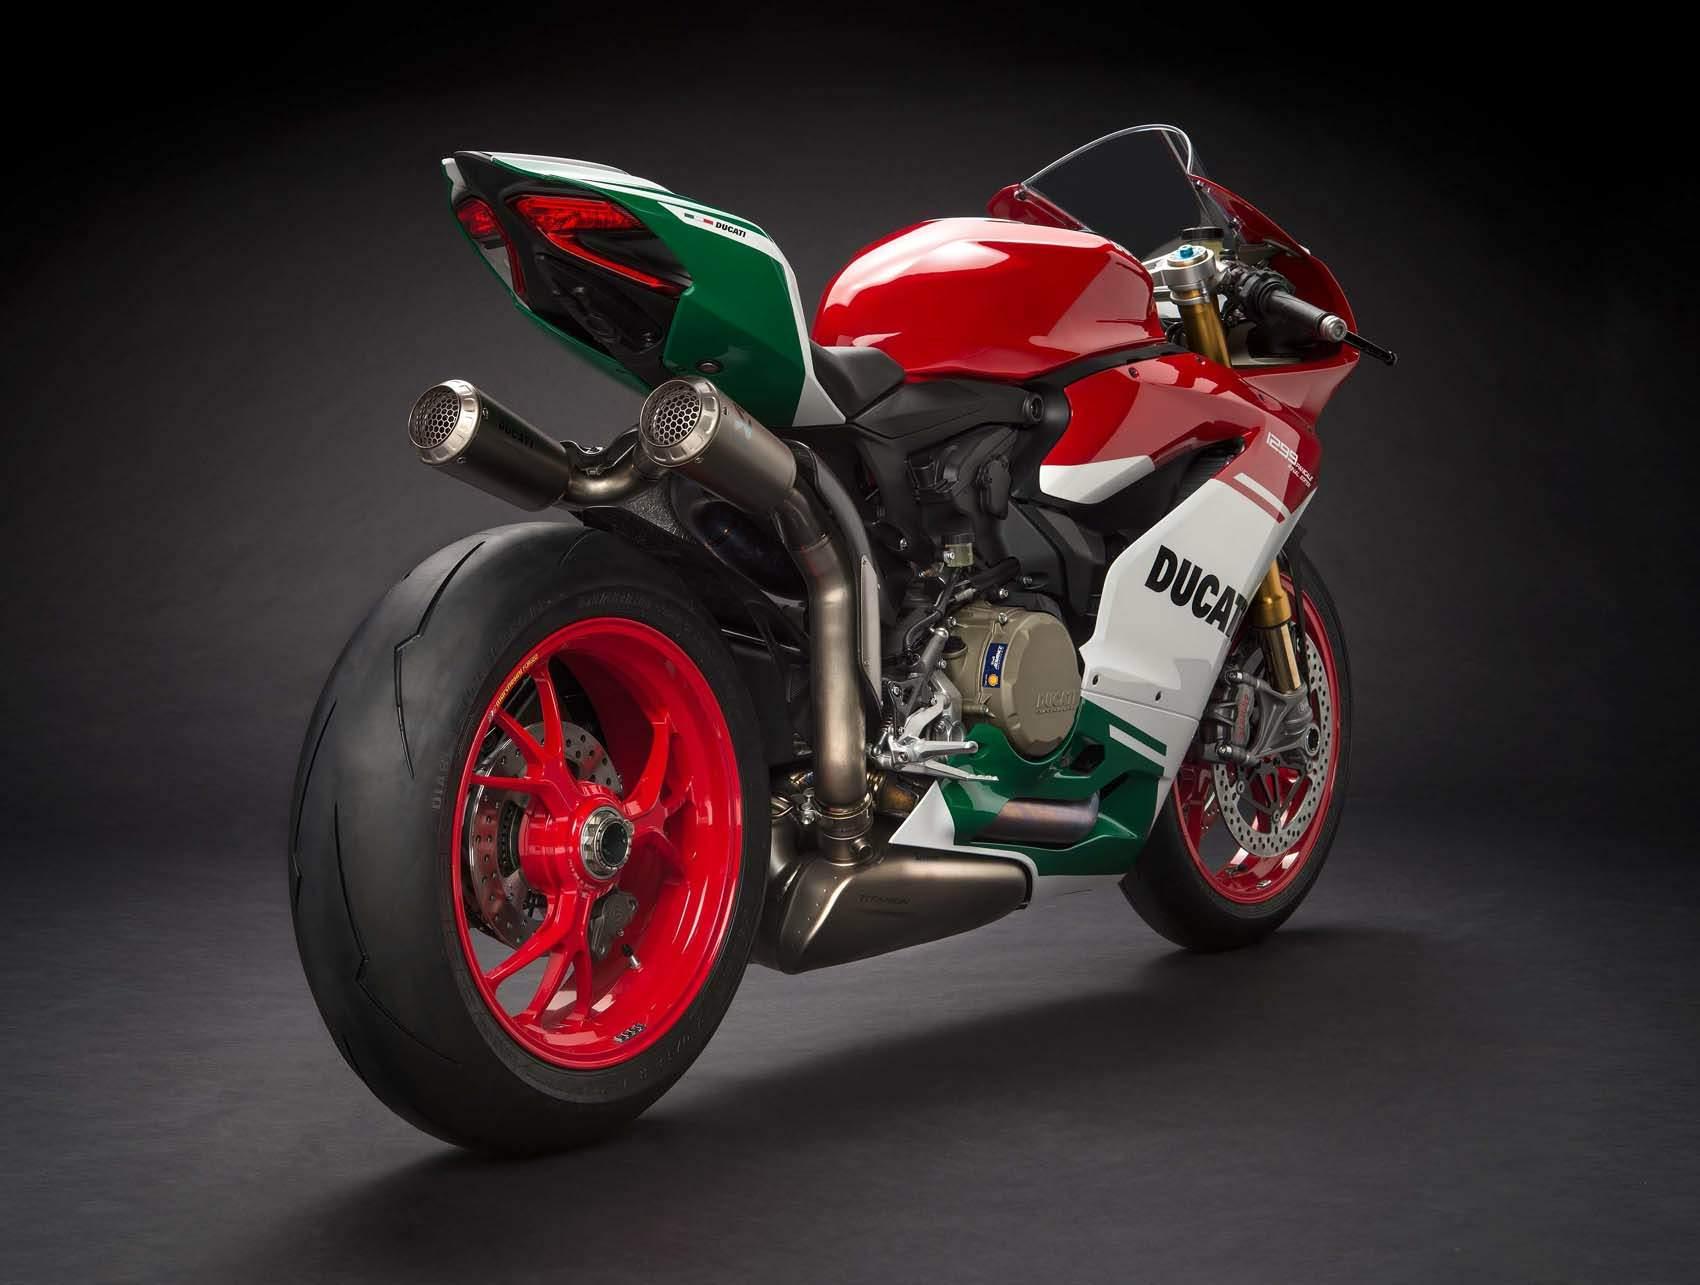 2017 Ducati 1299r Panigale Final Edition